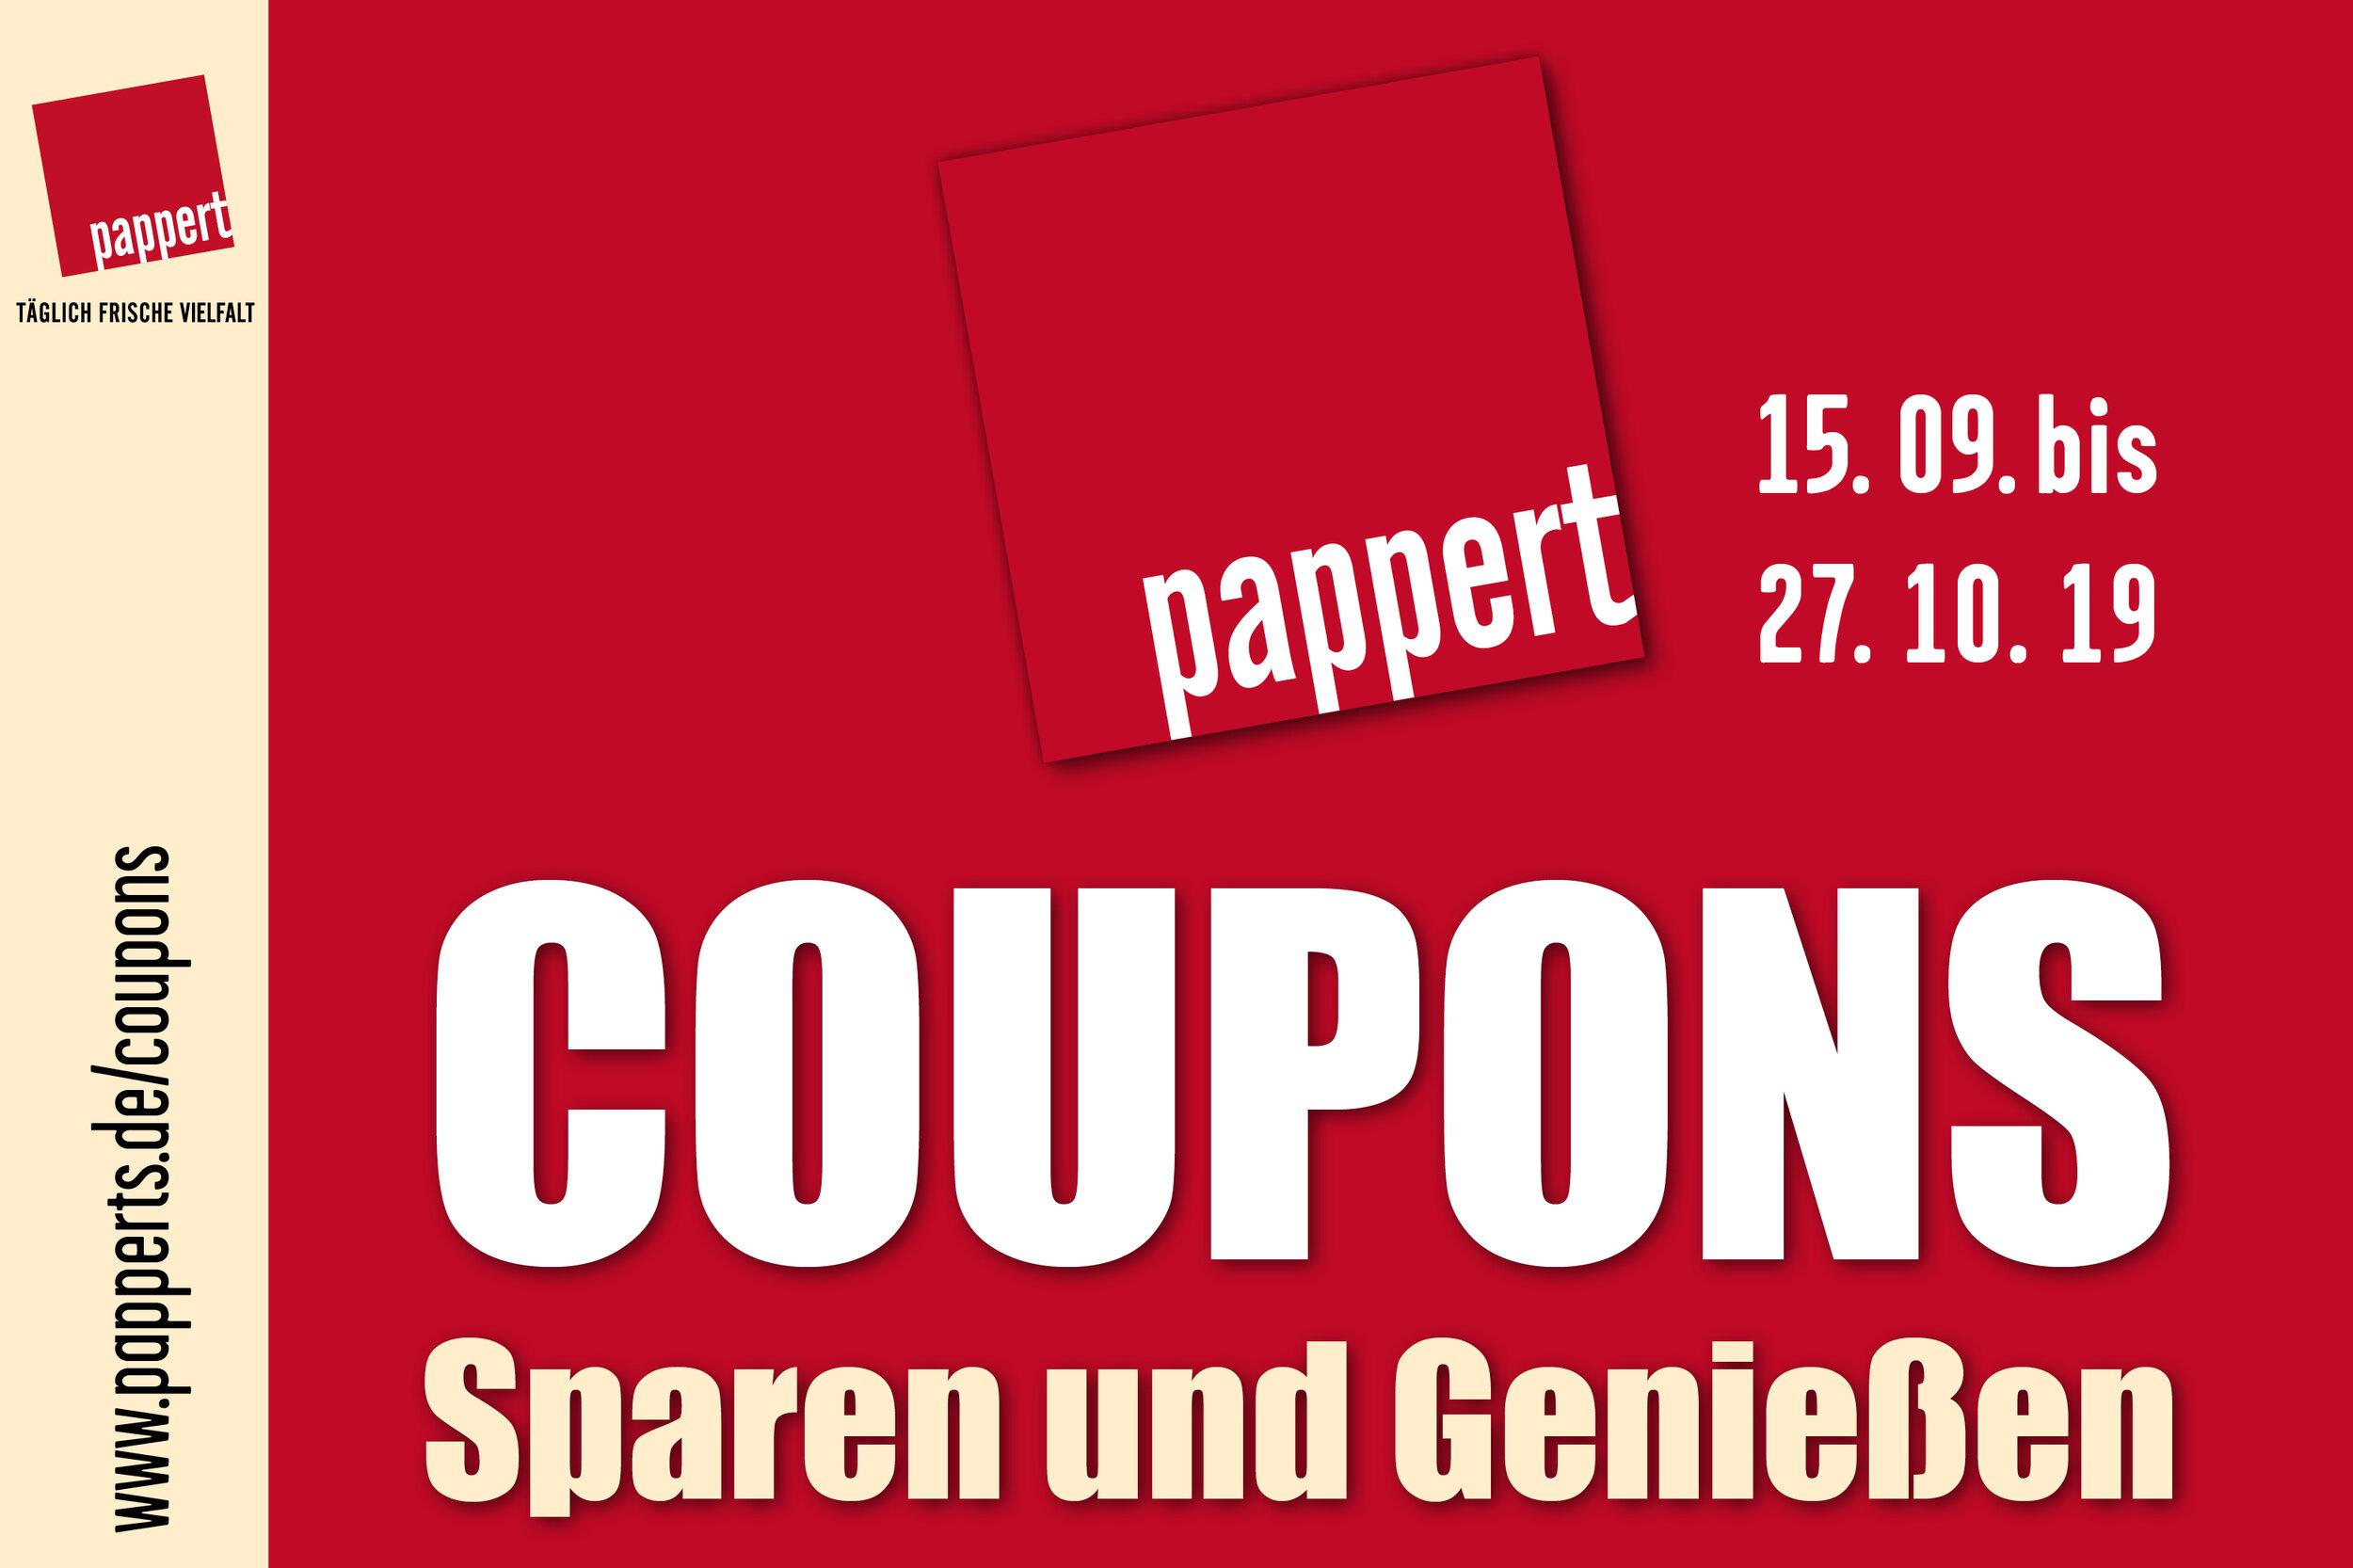 pappert_startseite_Coupon Aktion 05:19.jpg